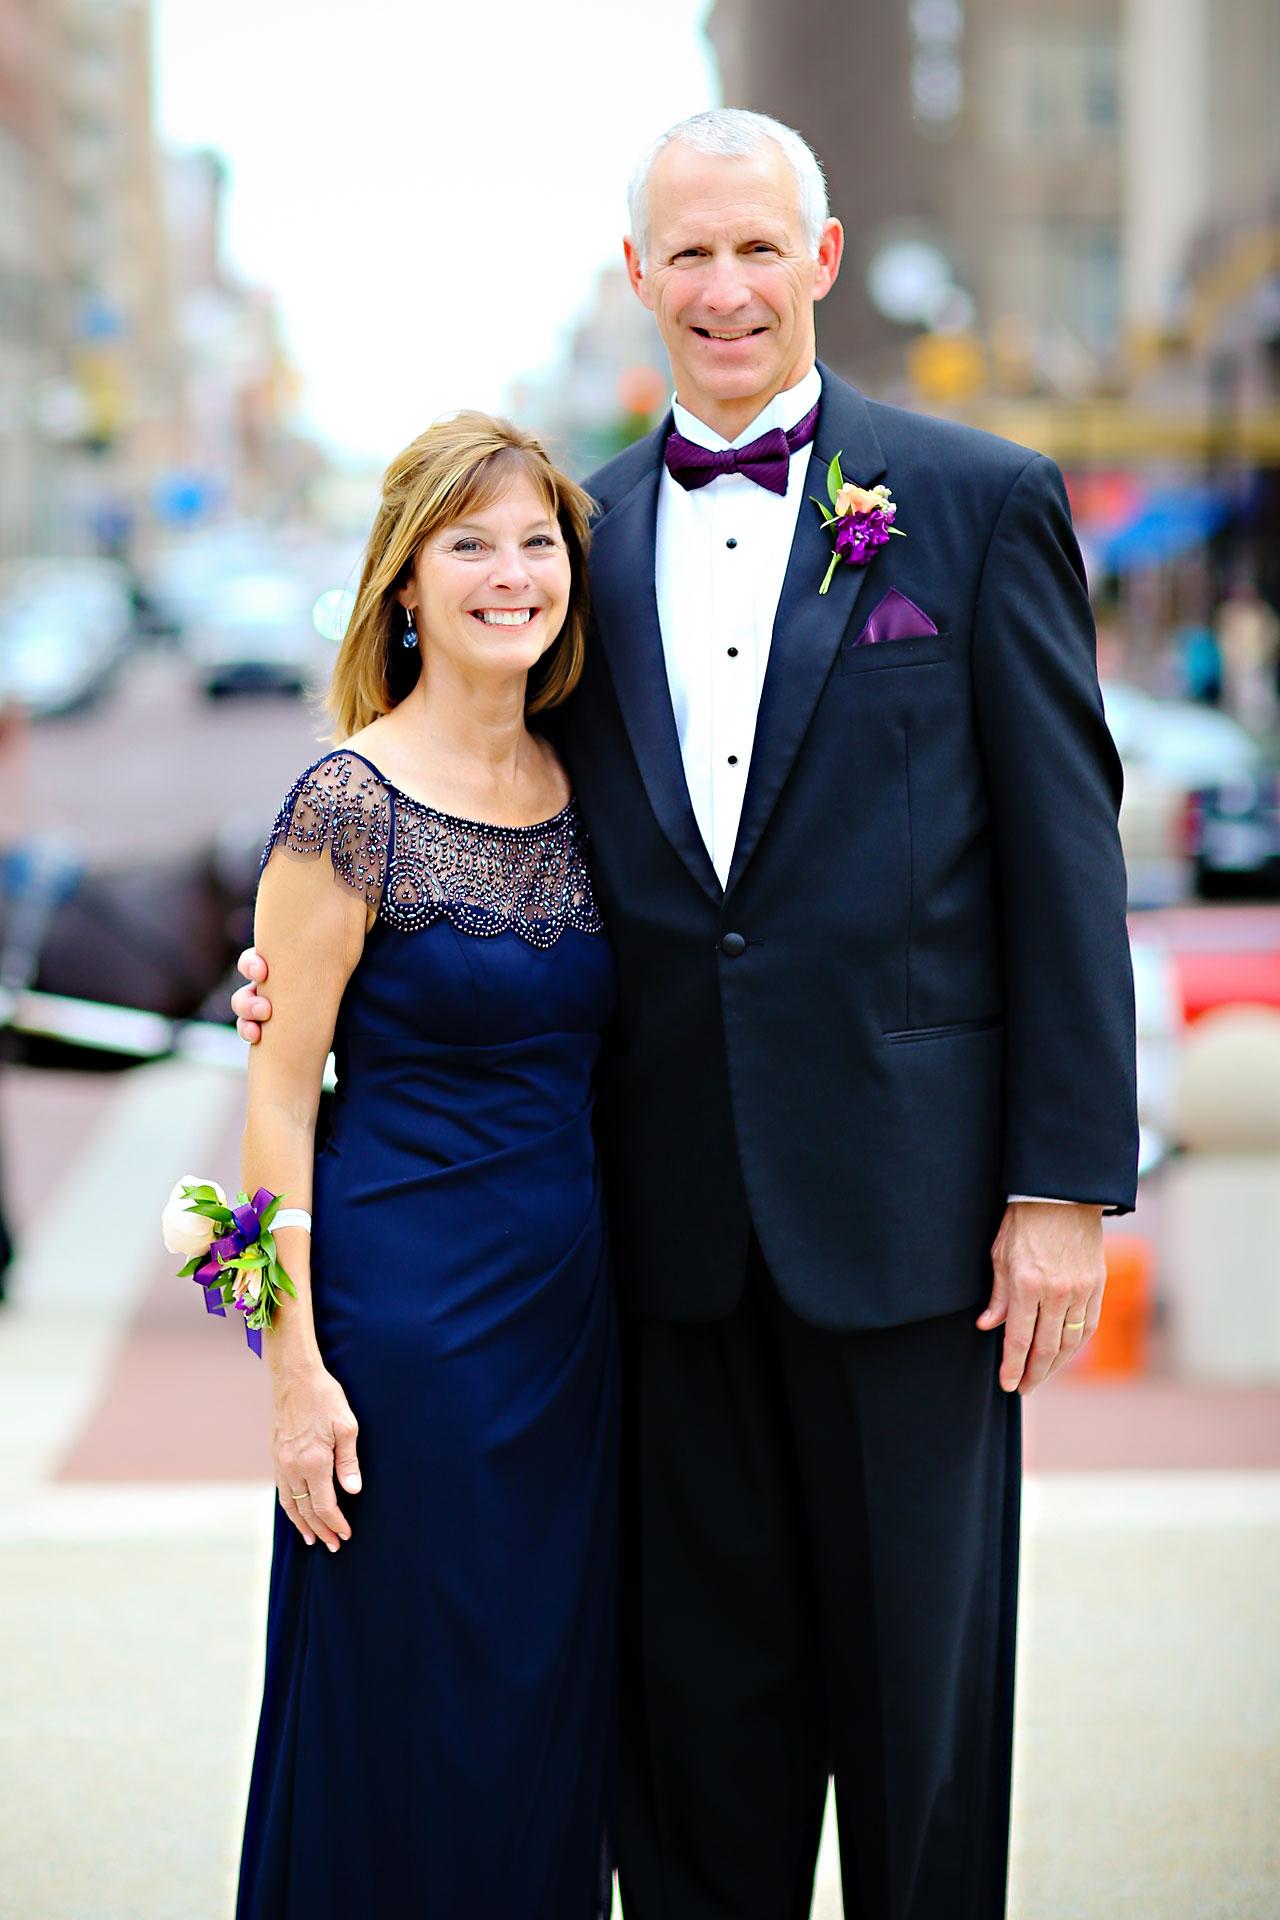 Chandra Kevin Indiana Roof Ballroom wedding 0107